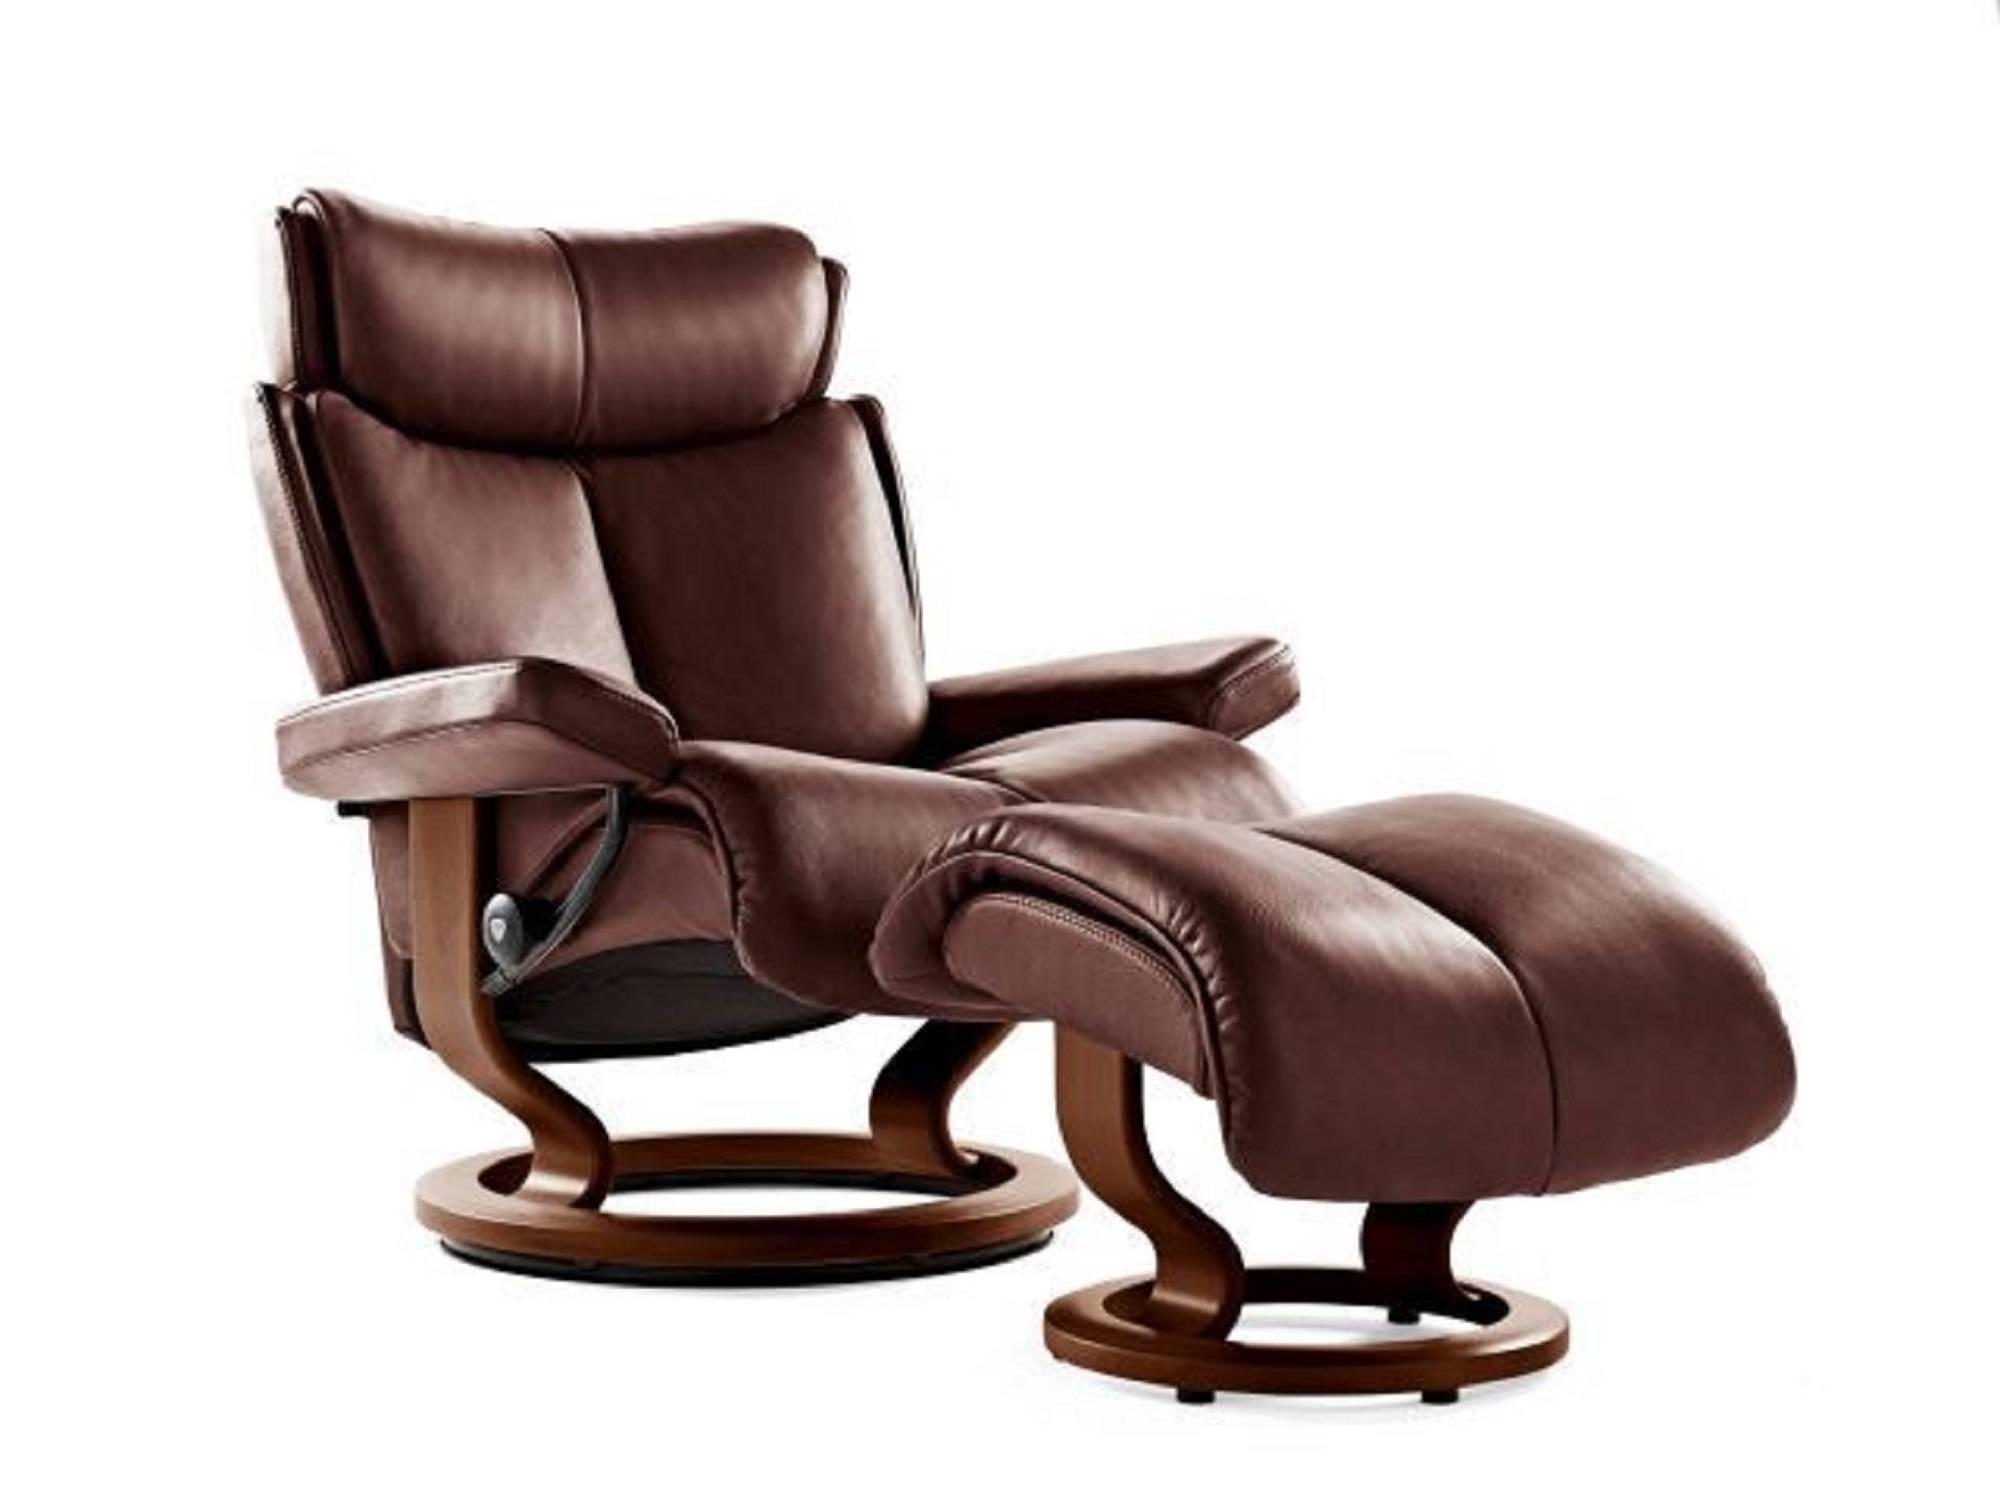 Magnificent Stressless Magic Chair Stool Set Creativecarmelina Interior Chair Design Creativecarmelinacom